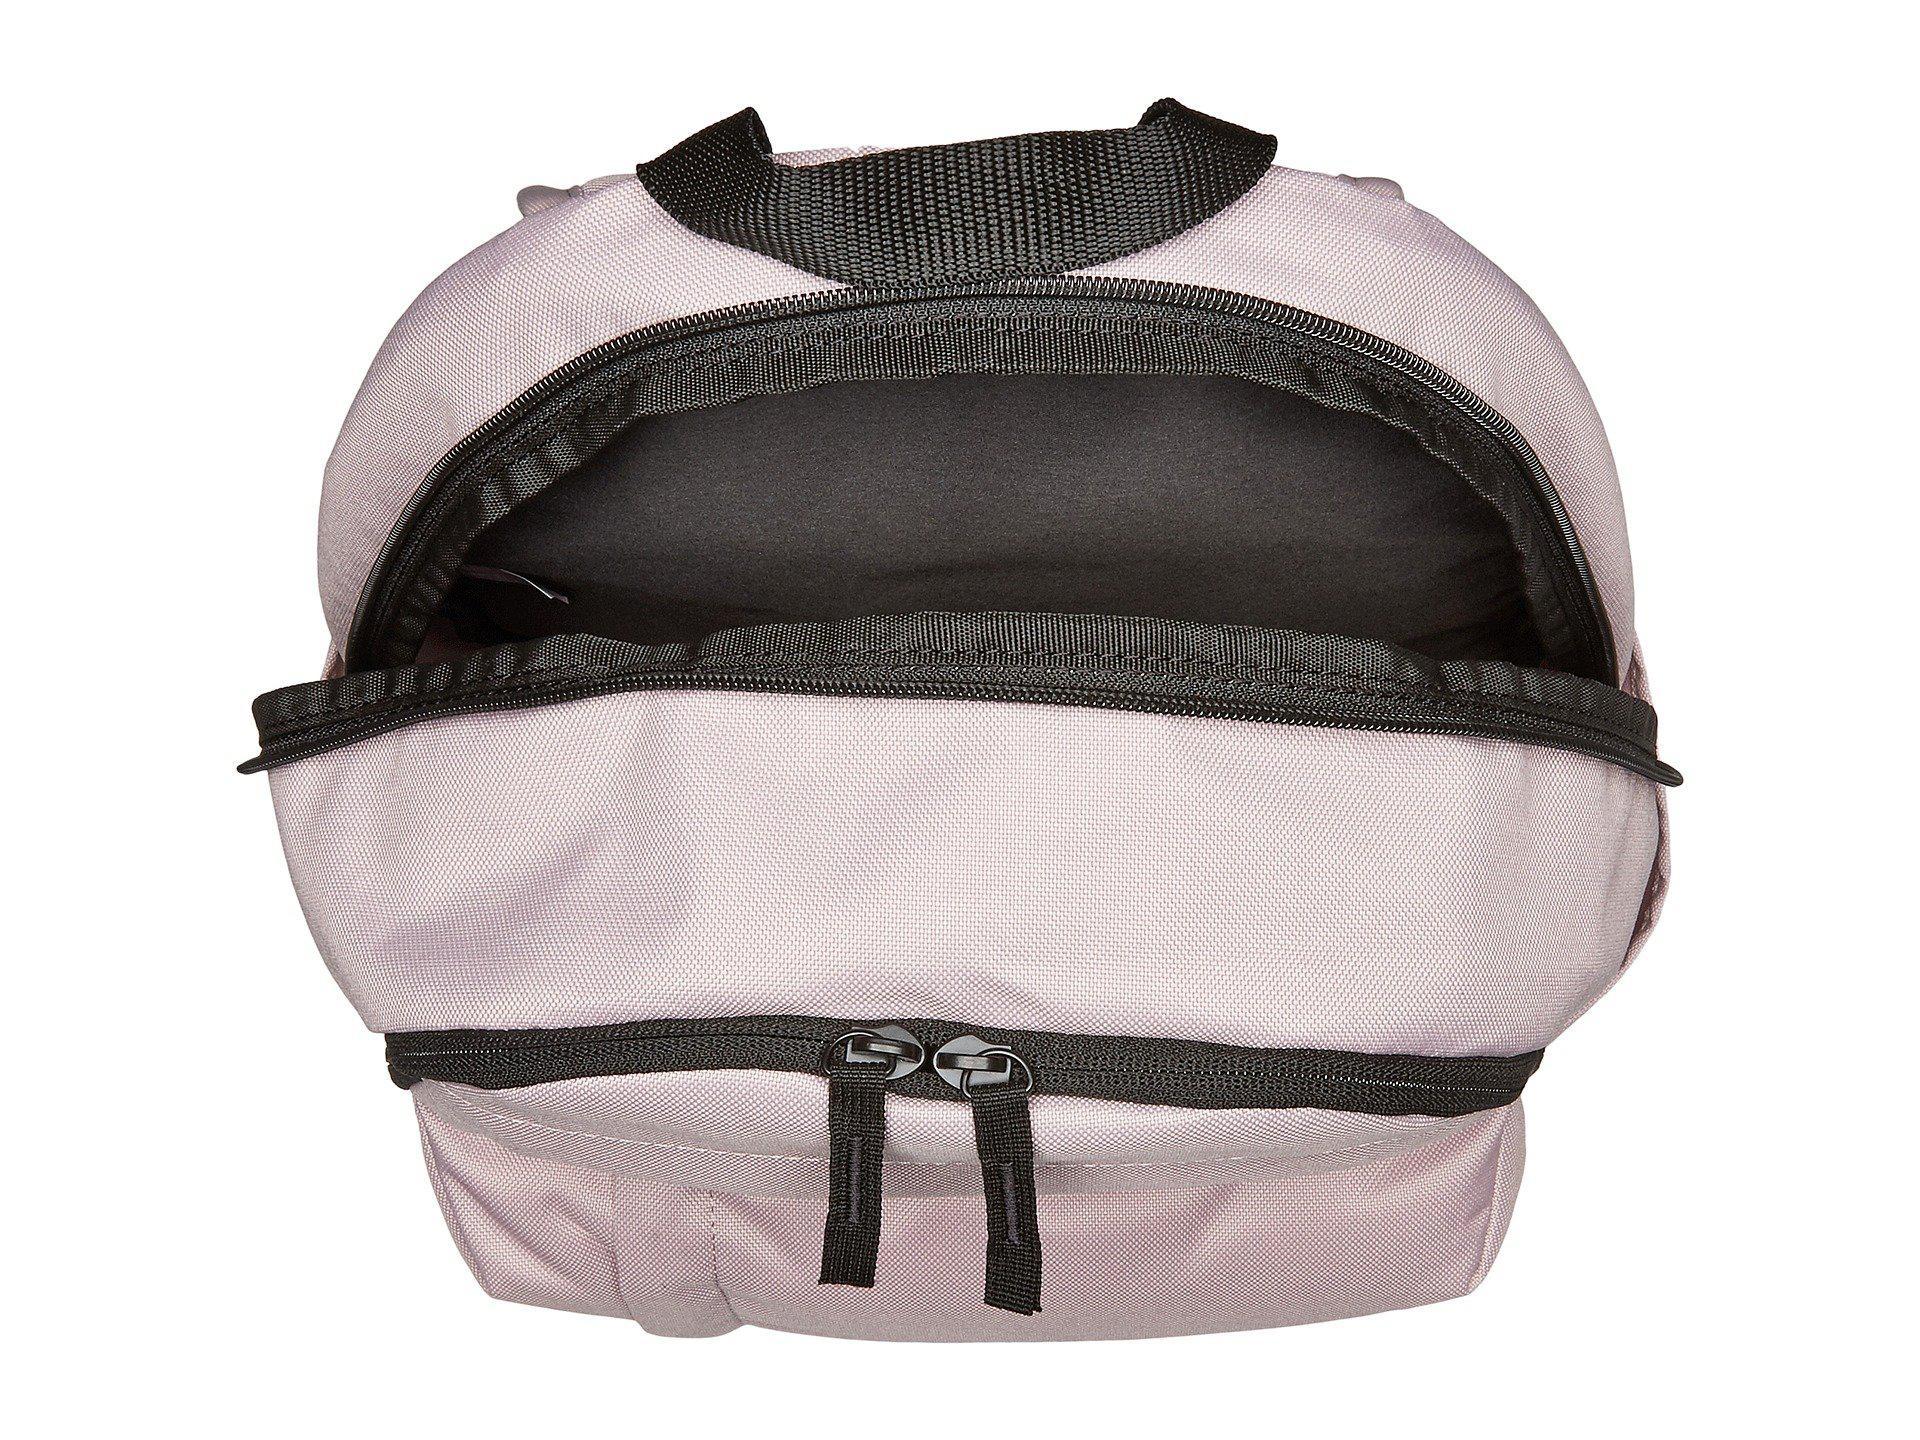 Lyst - Nike Elemental Backpack - Lbr in Black 3f6796b025542